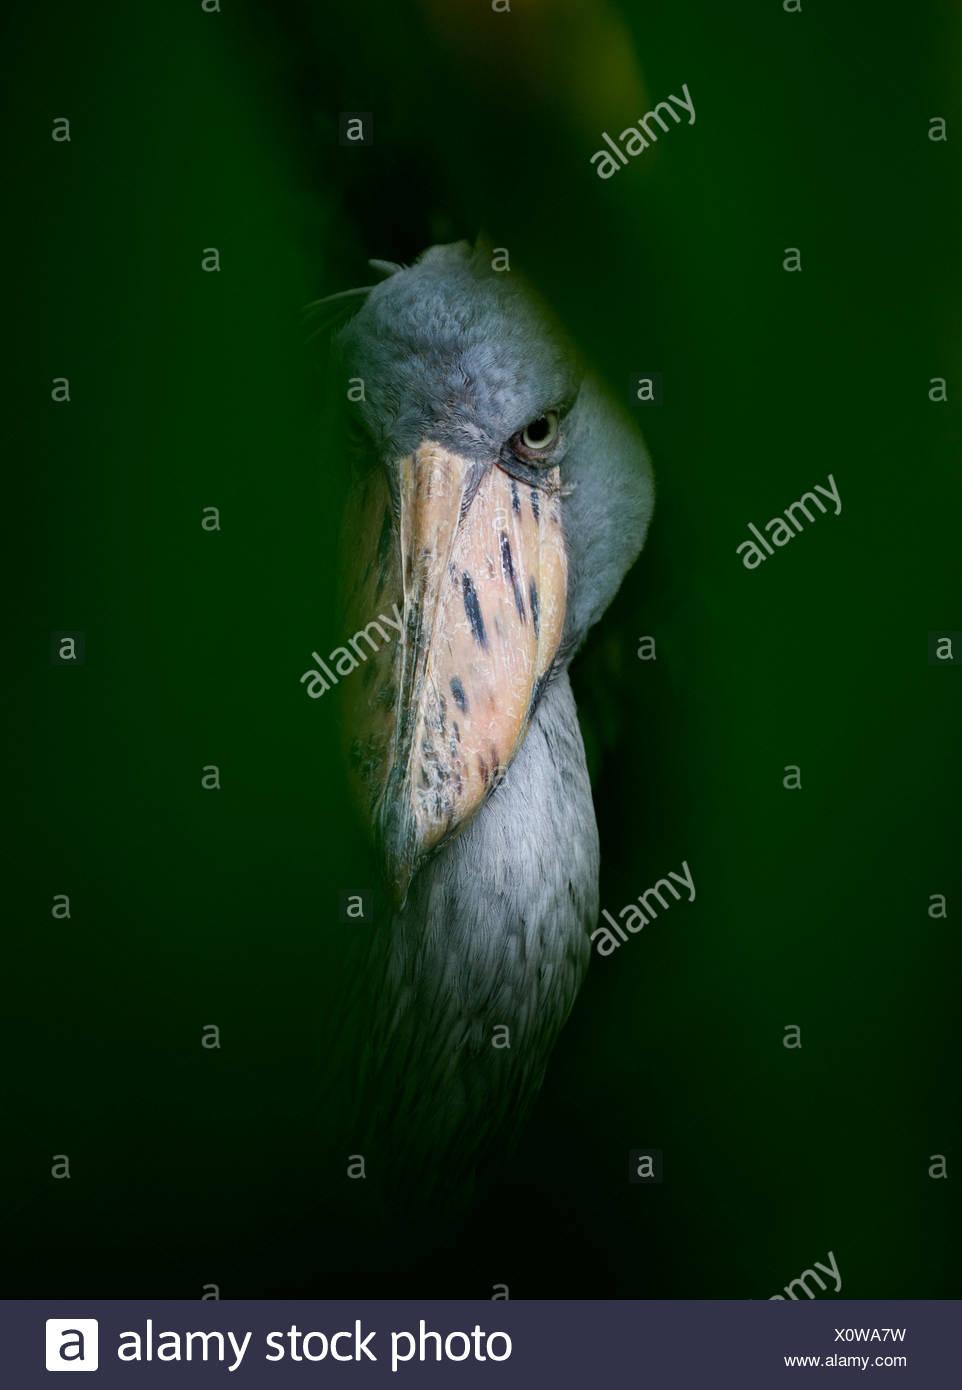 Schuhschnabel Stork(Balaeniceps rex) gefangen Stockbild